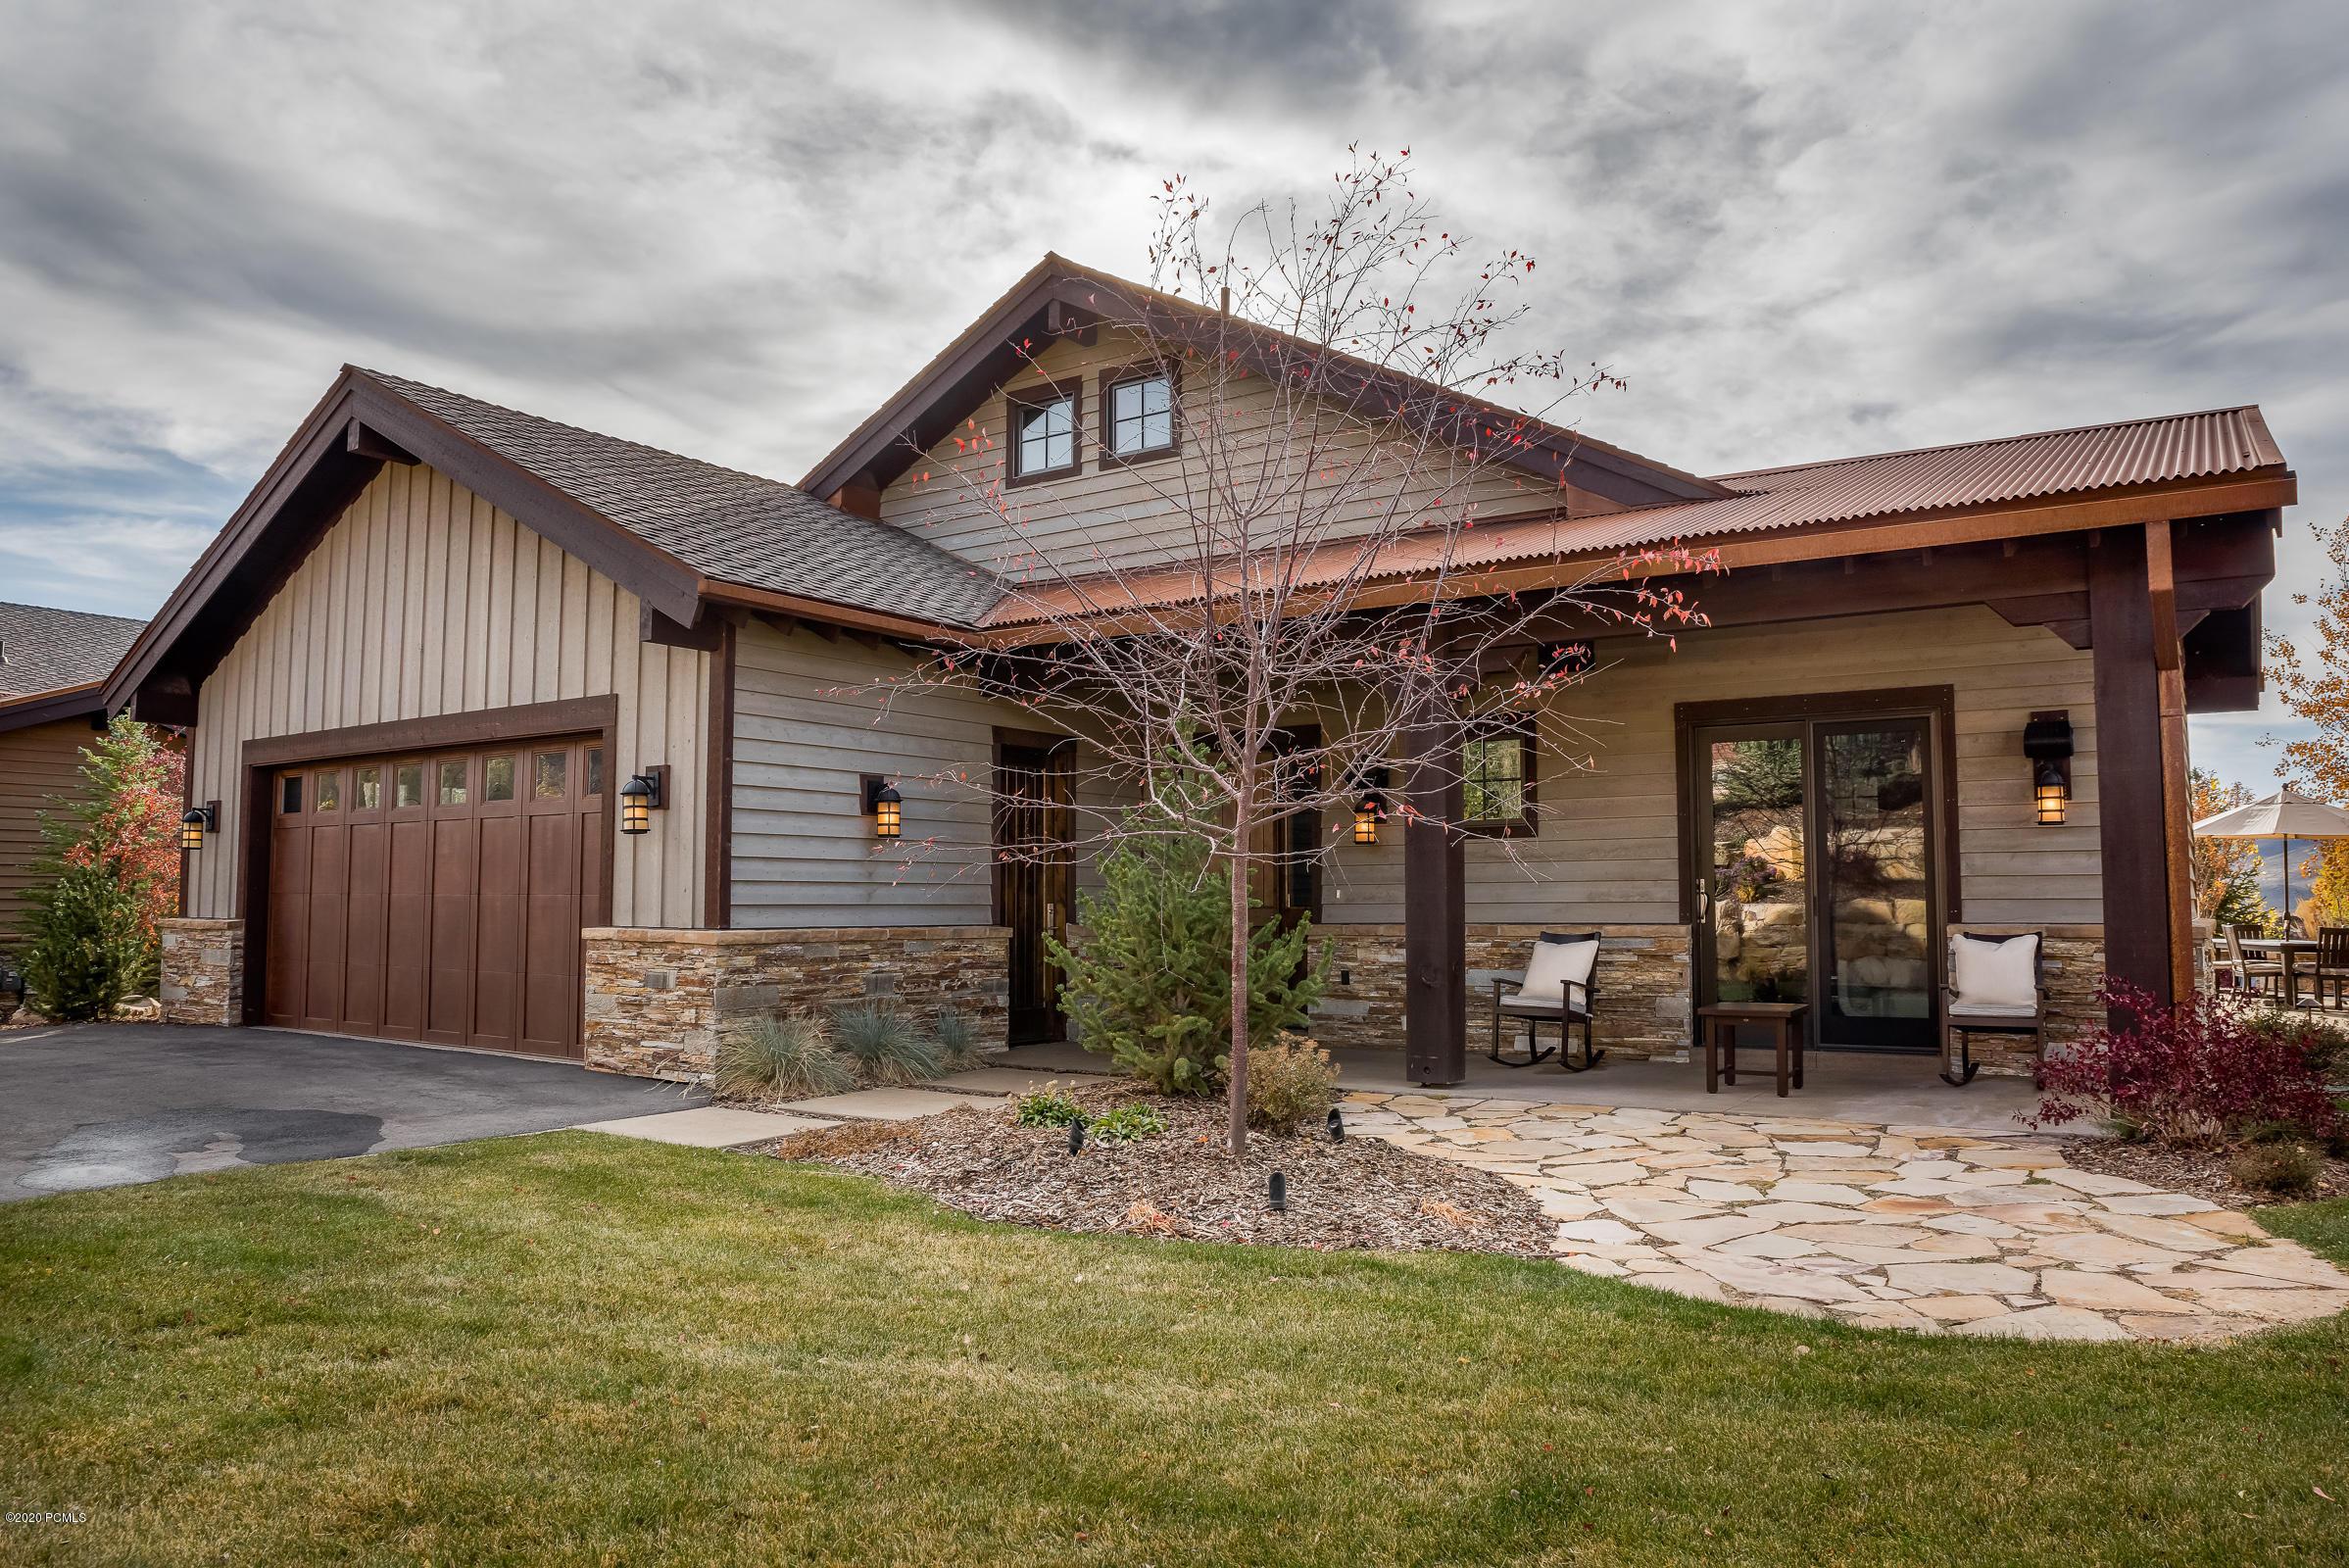 953 Cabin Way, Kamas, Utah 84036, 3 Bedrooms Bedrooms, ,4 BathroomsBathrooms,Single Family,For Sale,Cabin,12002483